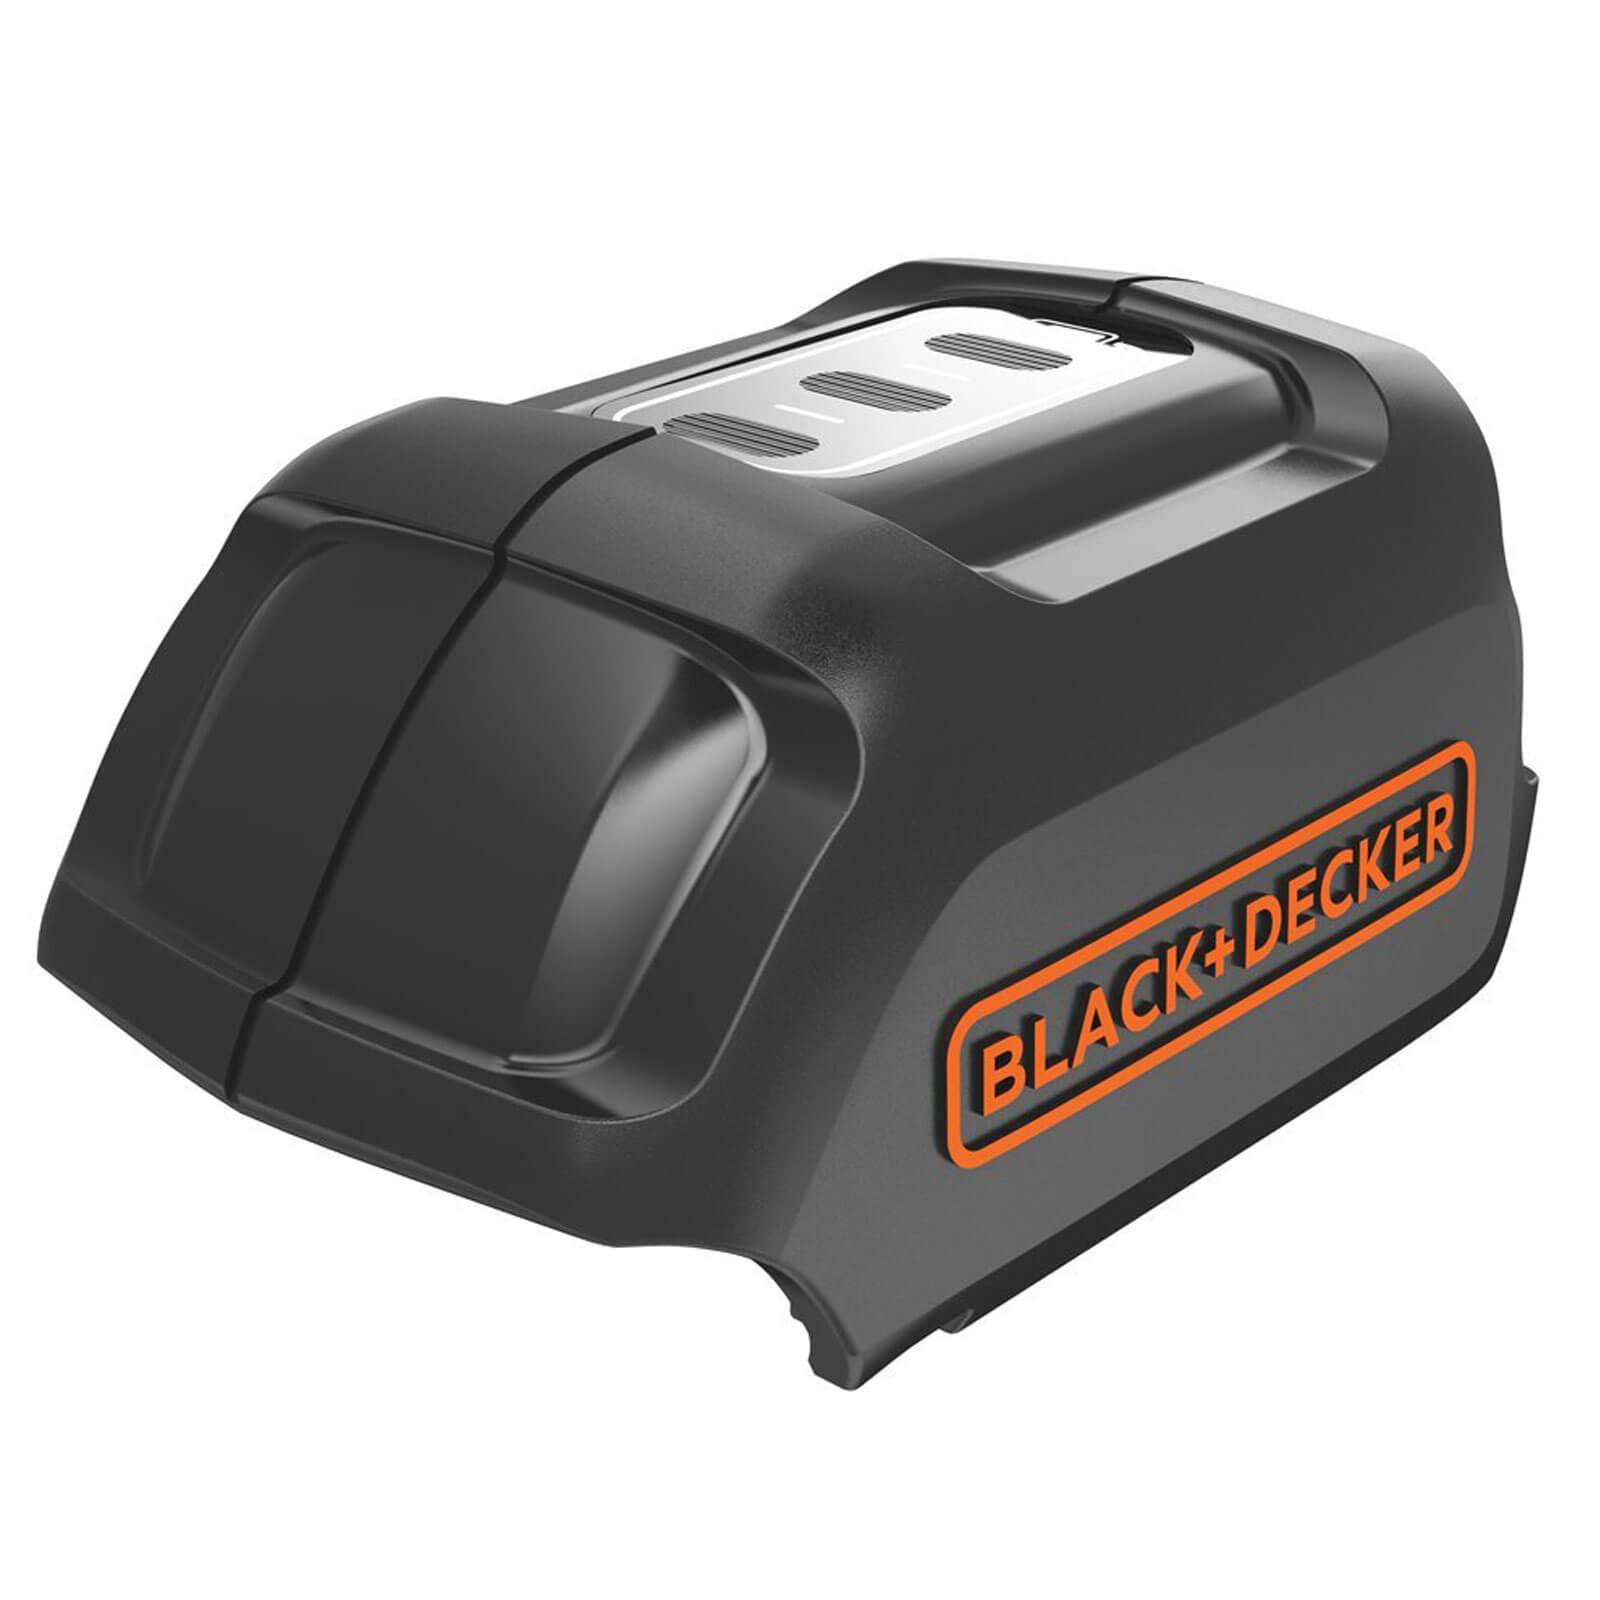 Image of Black & Decker BDCU15AN 18v Cordless USB Li-ion Battery Charger 5v